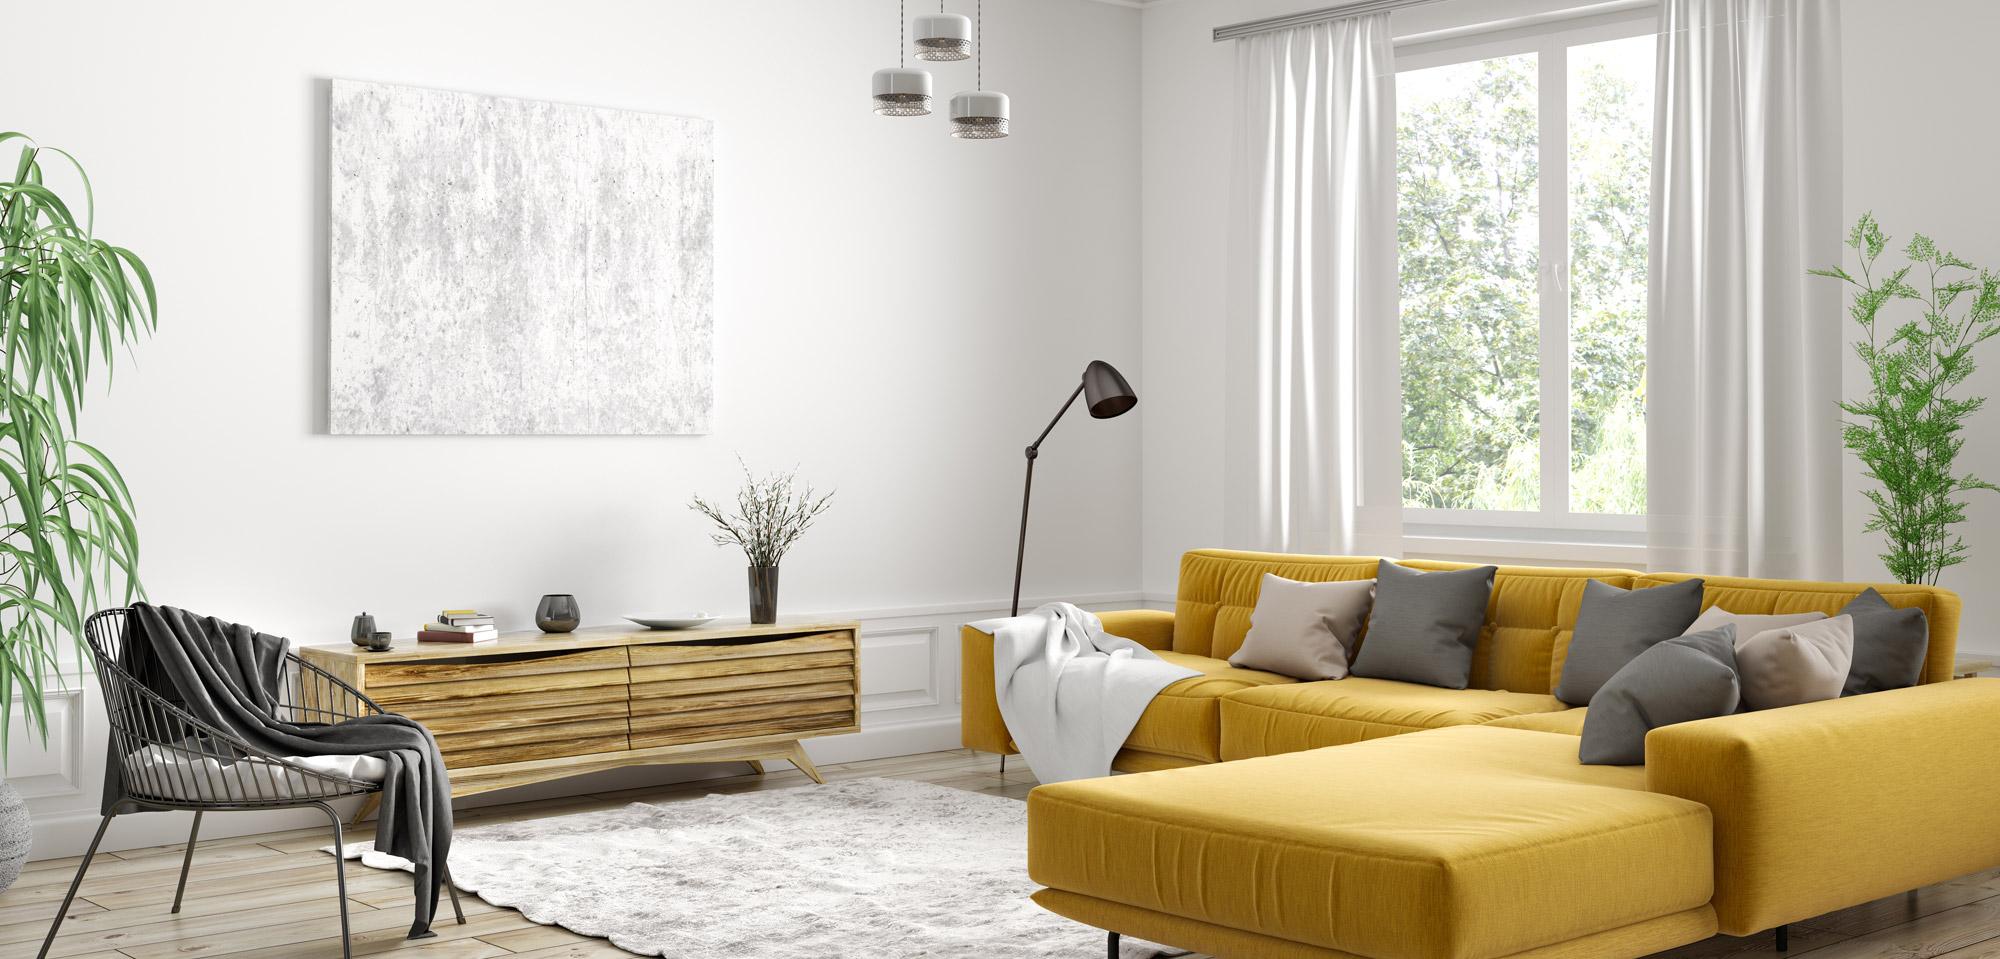 isolation-murs-interieur